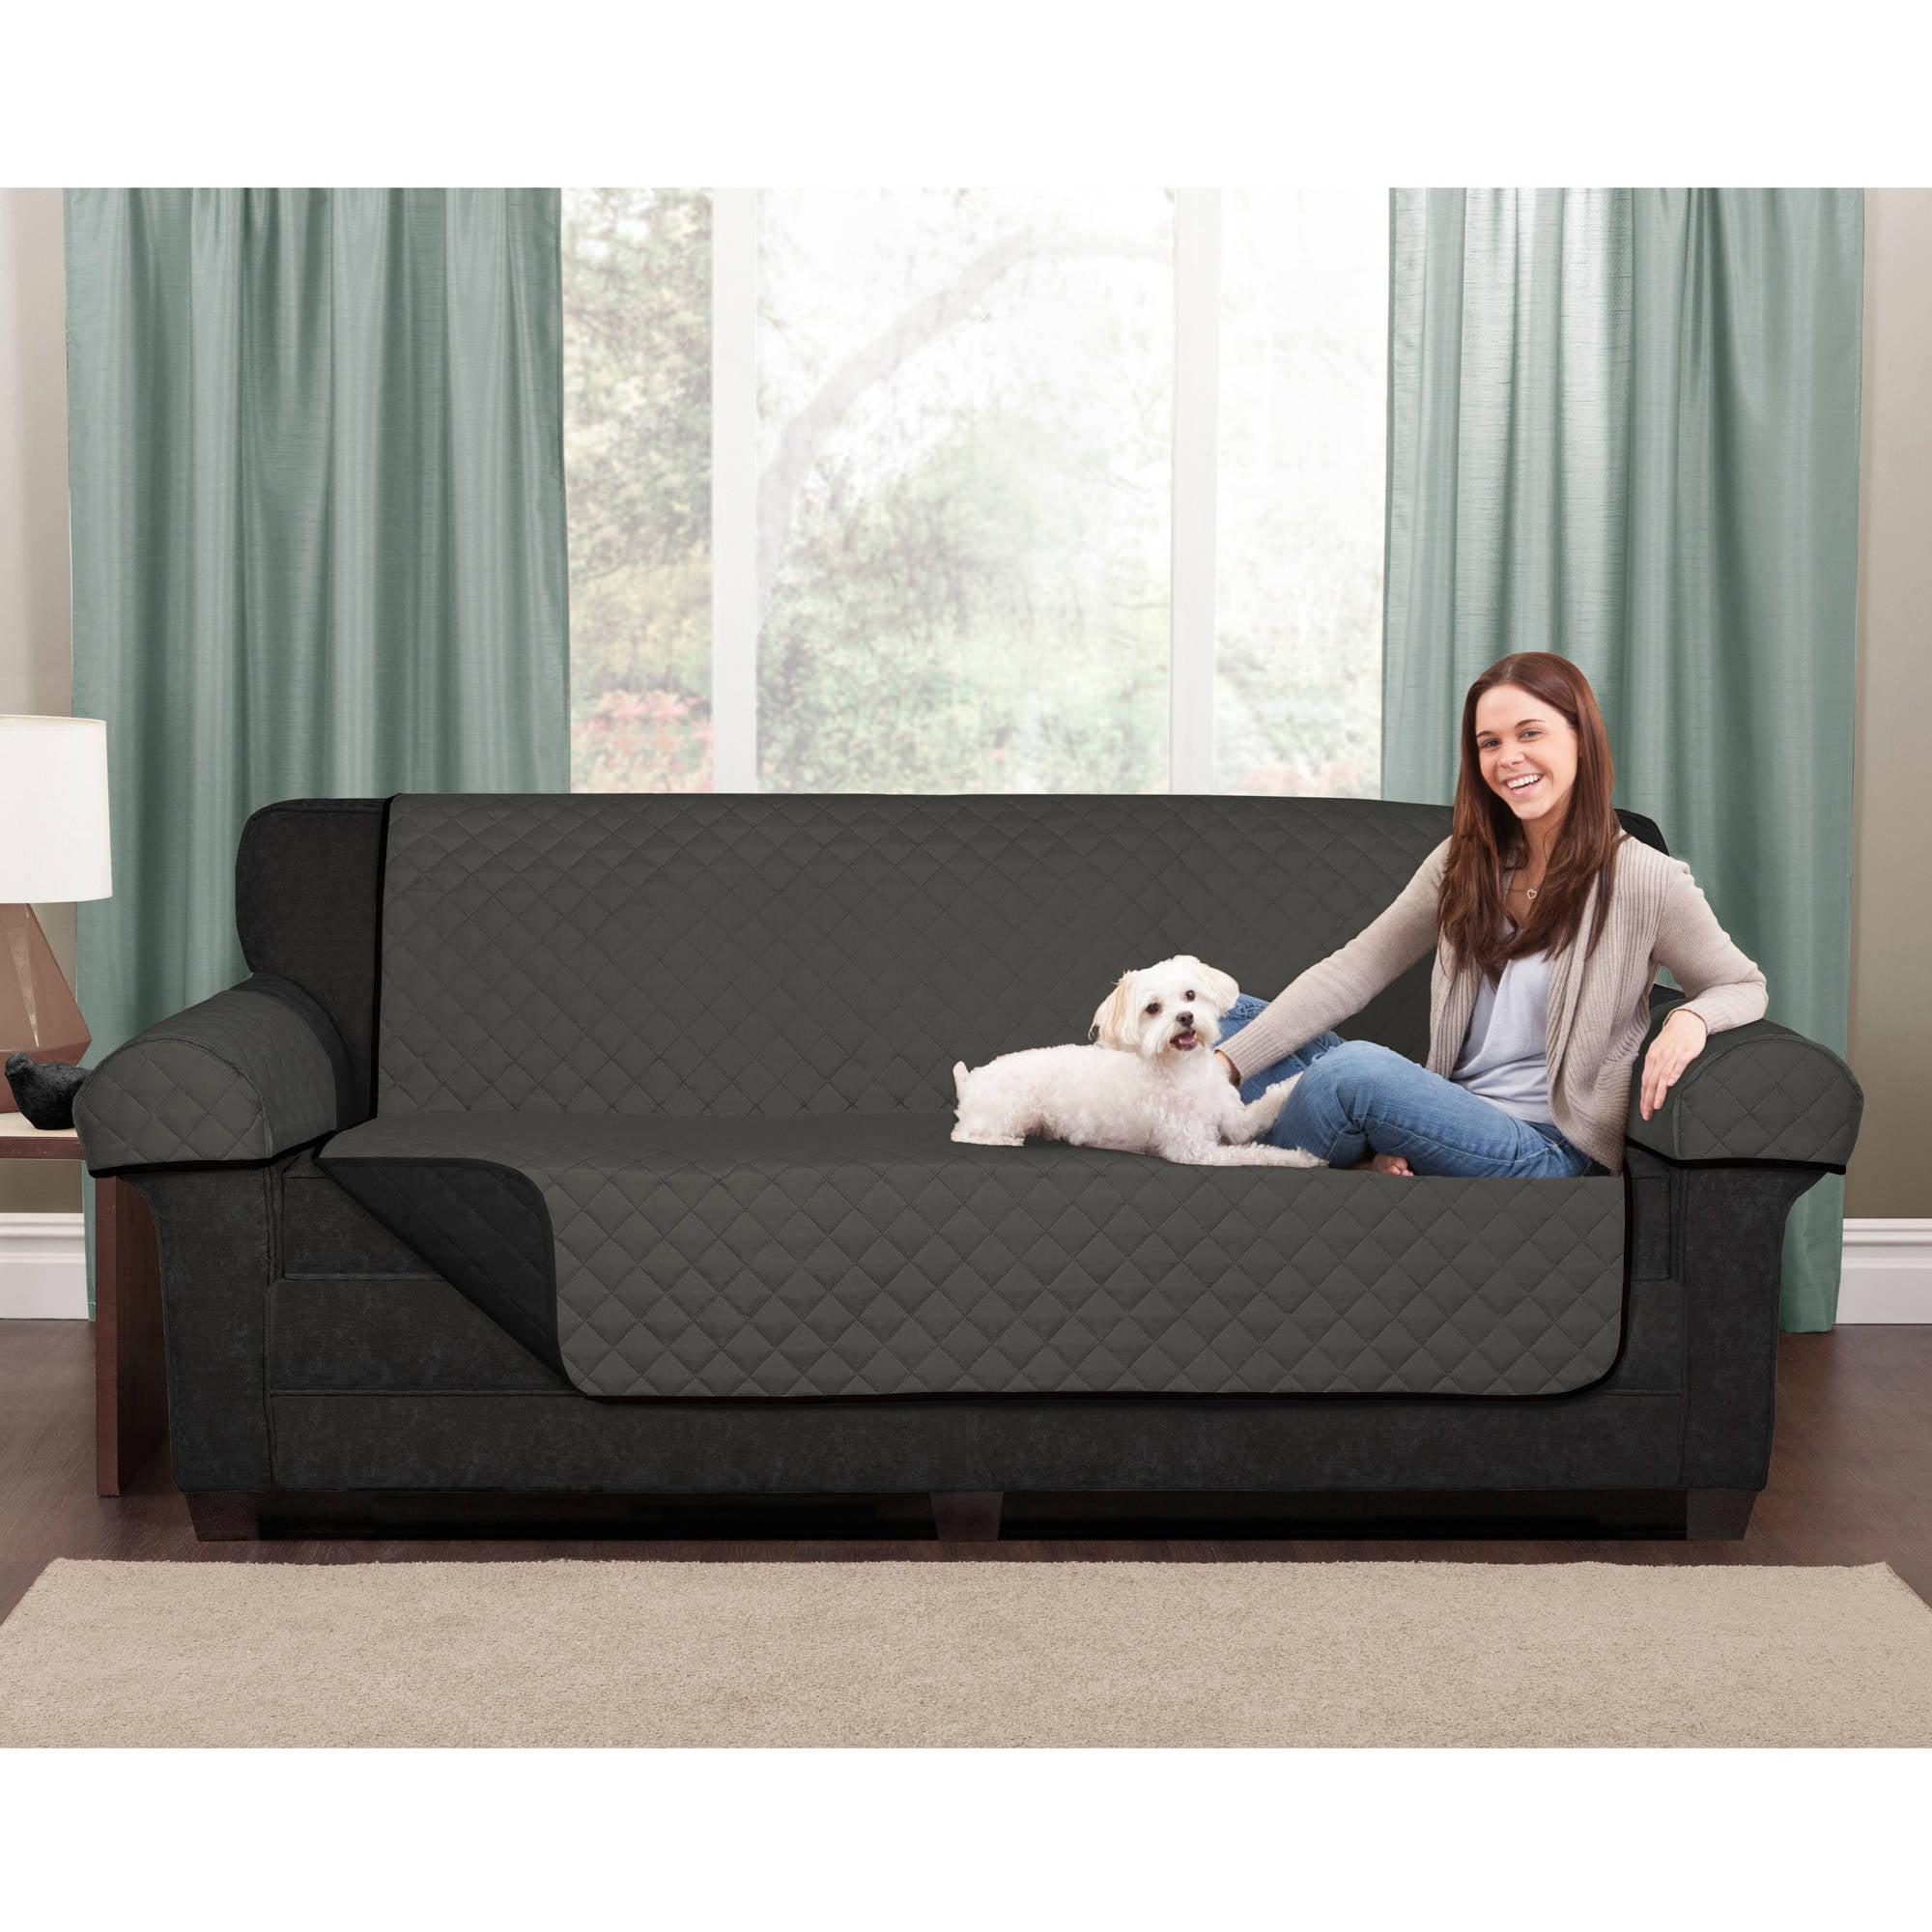 Maytex Reversible Microfiber Fabric Pet/Furniture Recliner Chair Cover